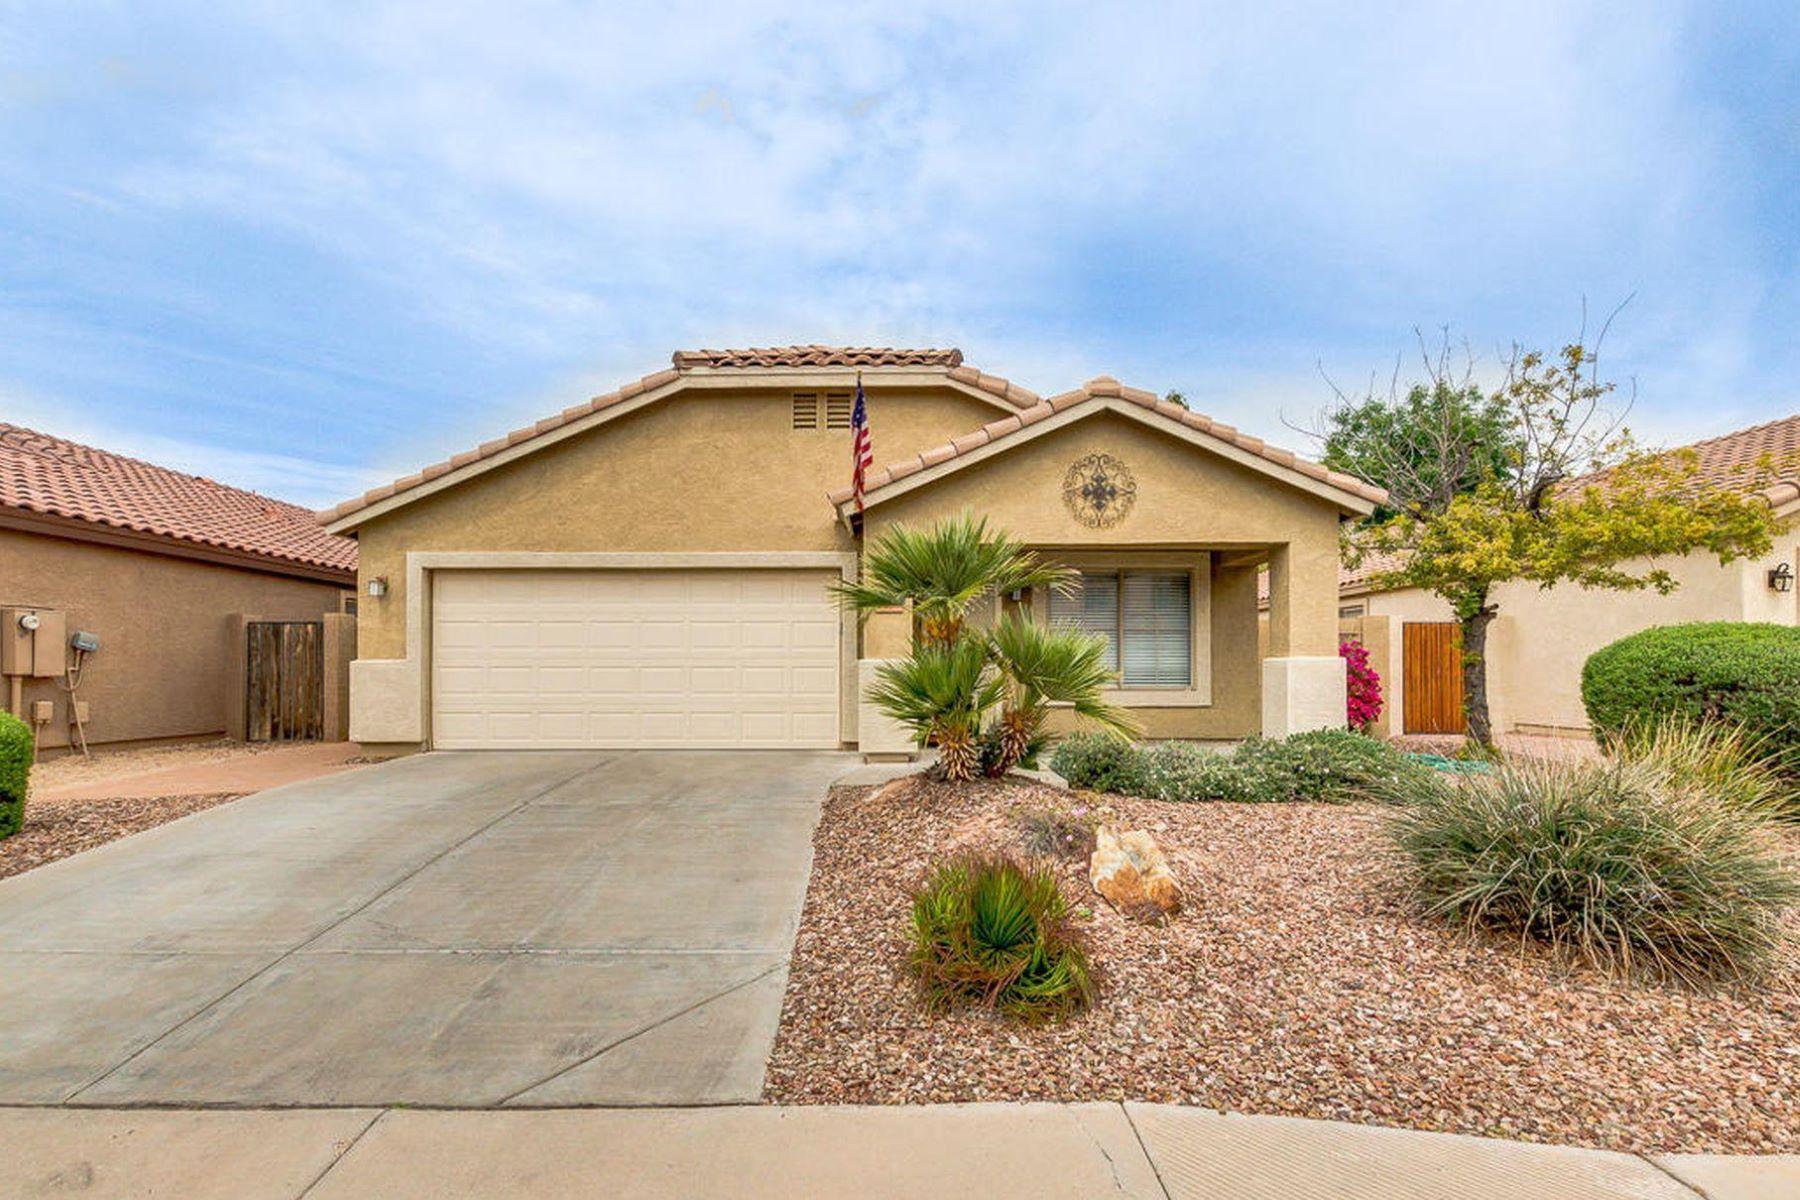 Single Family Homes για την Πώληση στο Valencia 2 7214 W Mohawk LN, Glendale, Αριζονα 85308 Ηνωμένες Πολιτείες